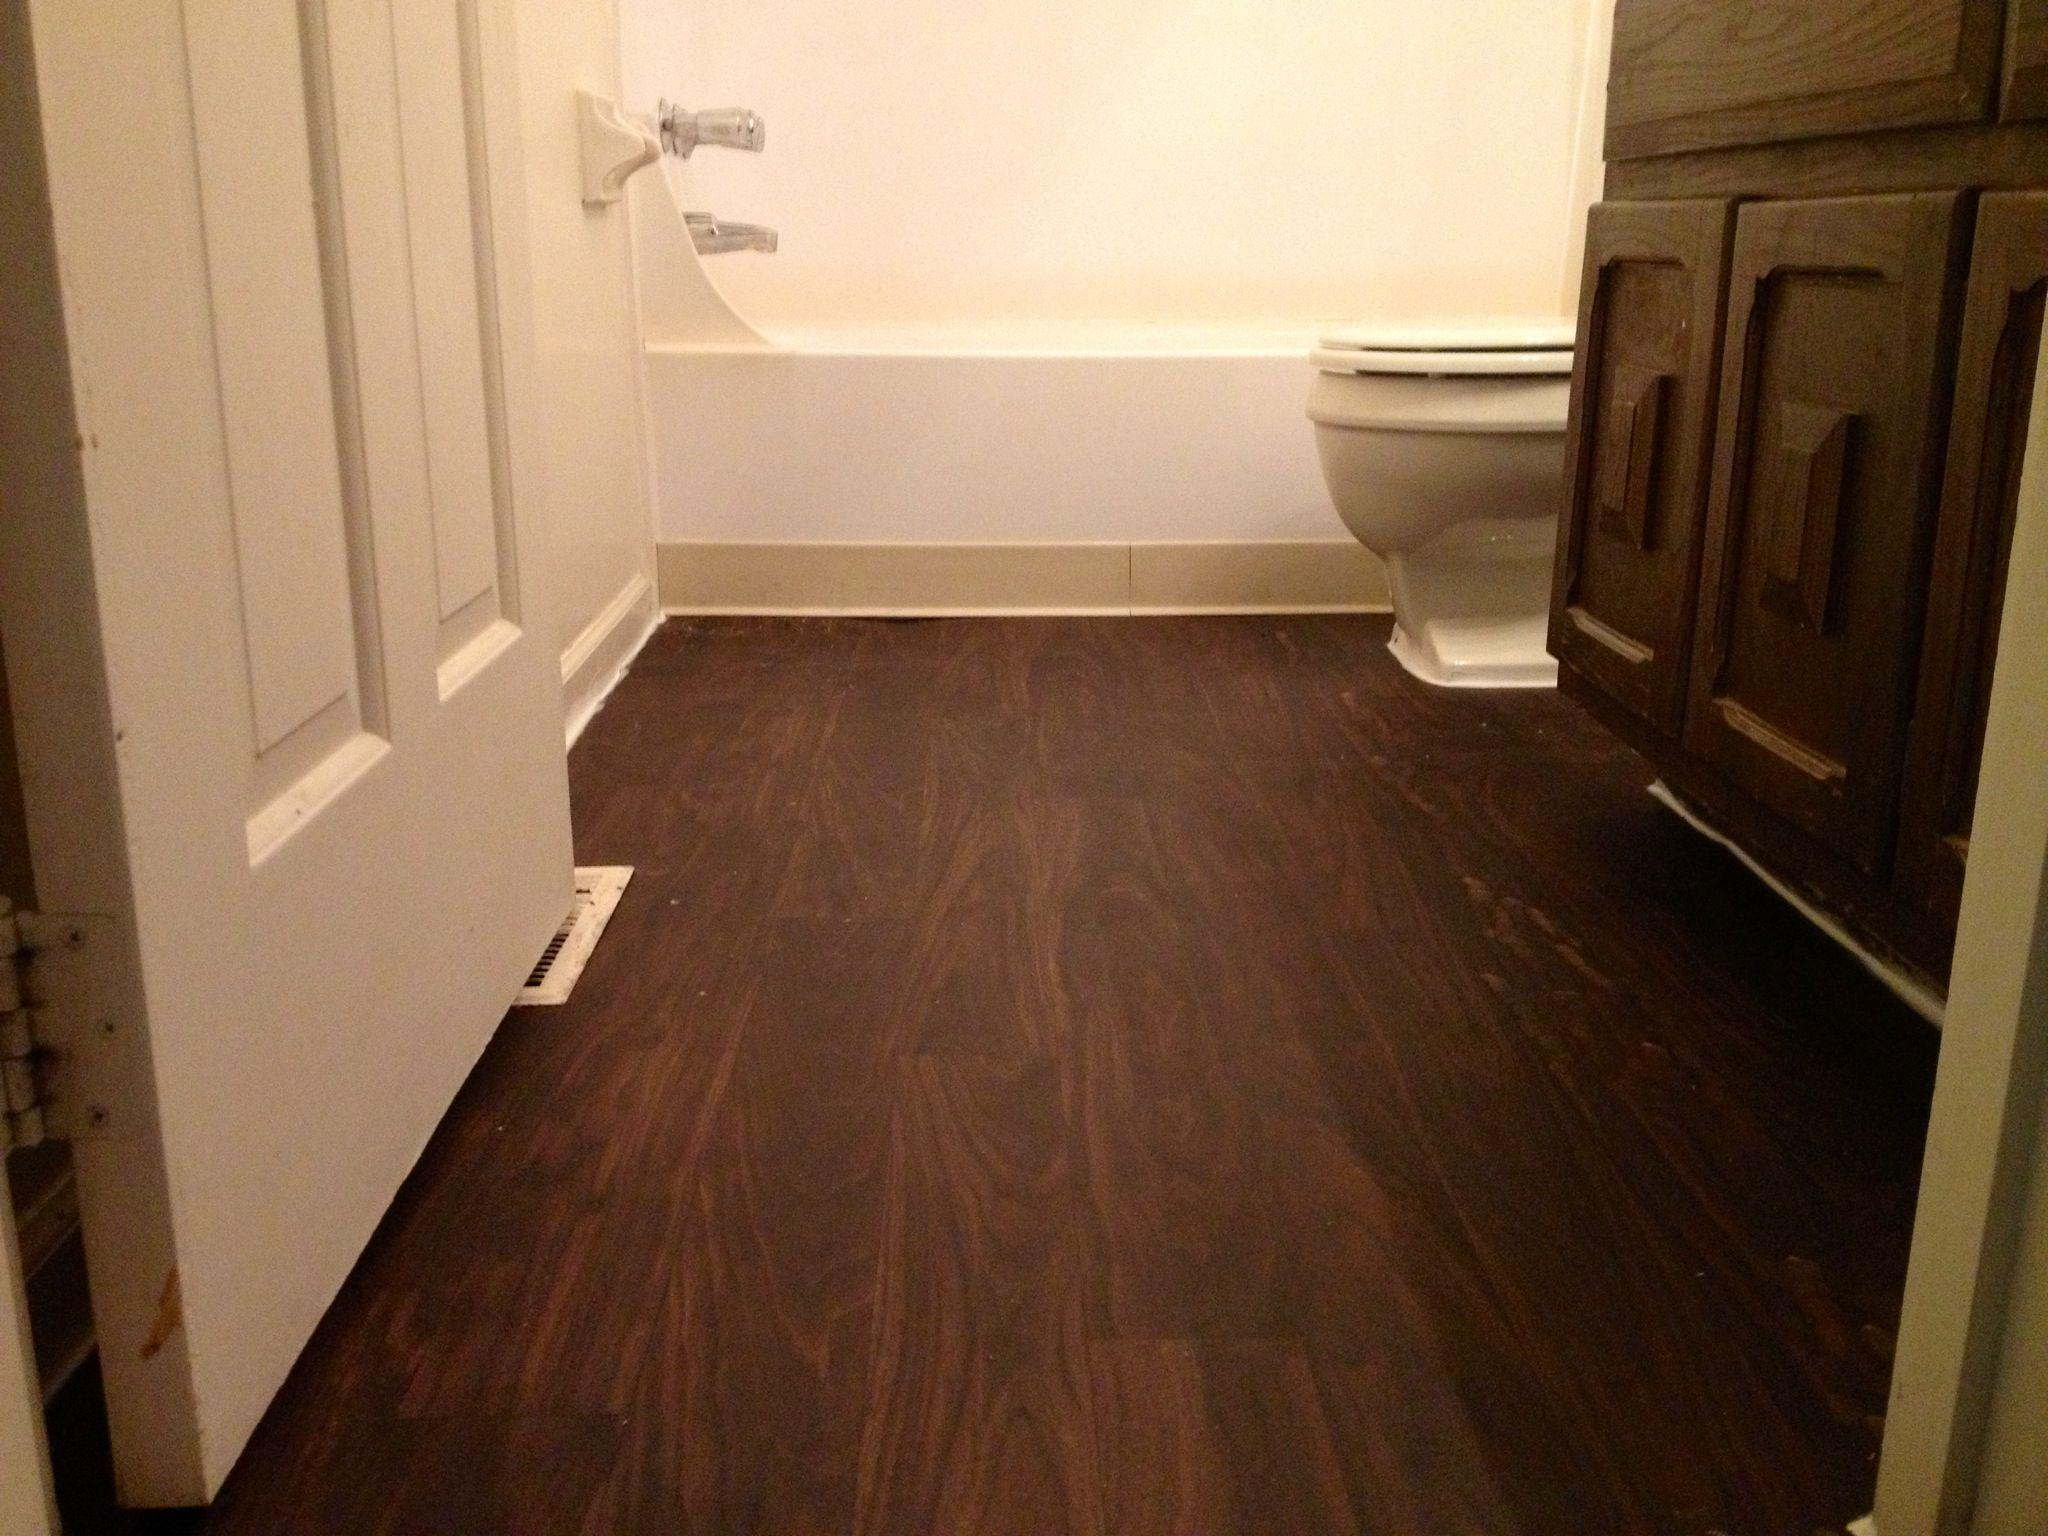 Vinyl Bathroom Flooring: Vinyl Bathroom Flooring...